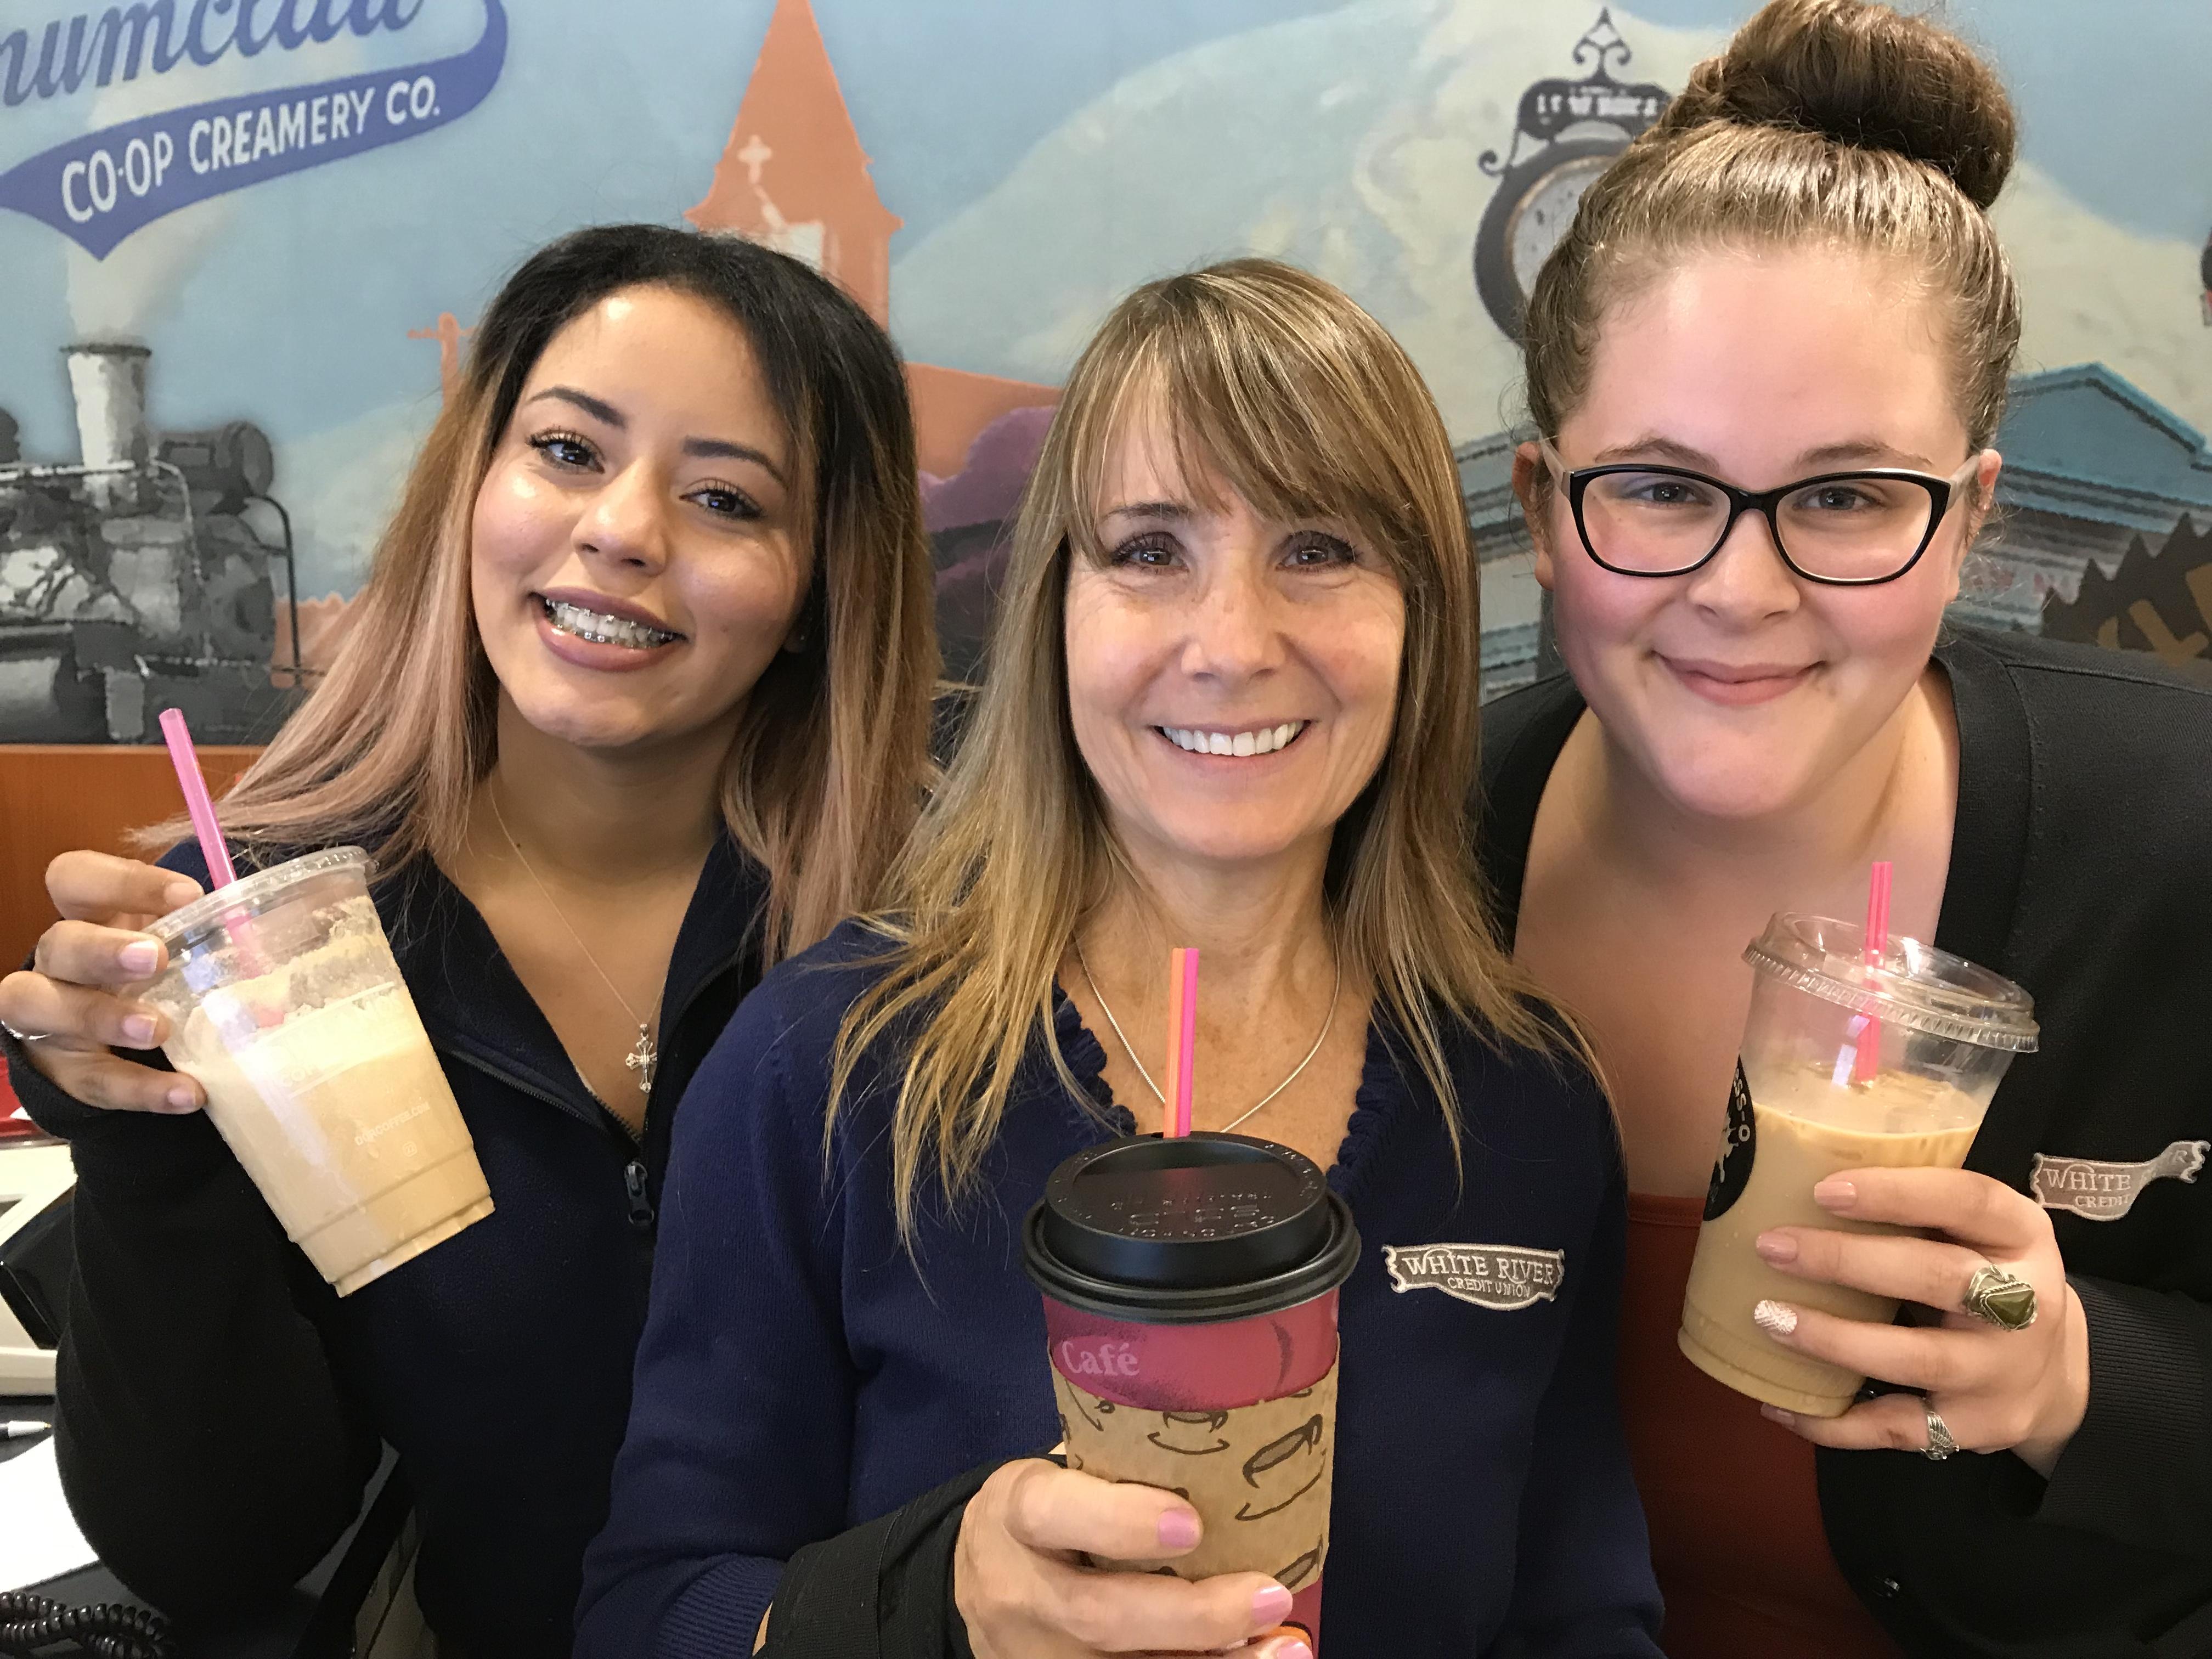 Three WRCU employees posing with coffee from Mocha Motion